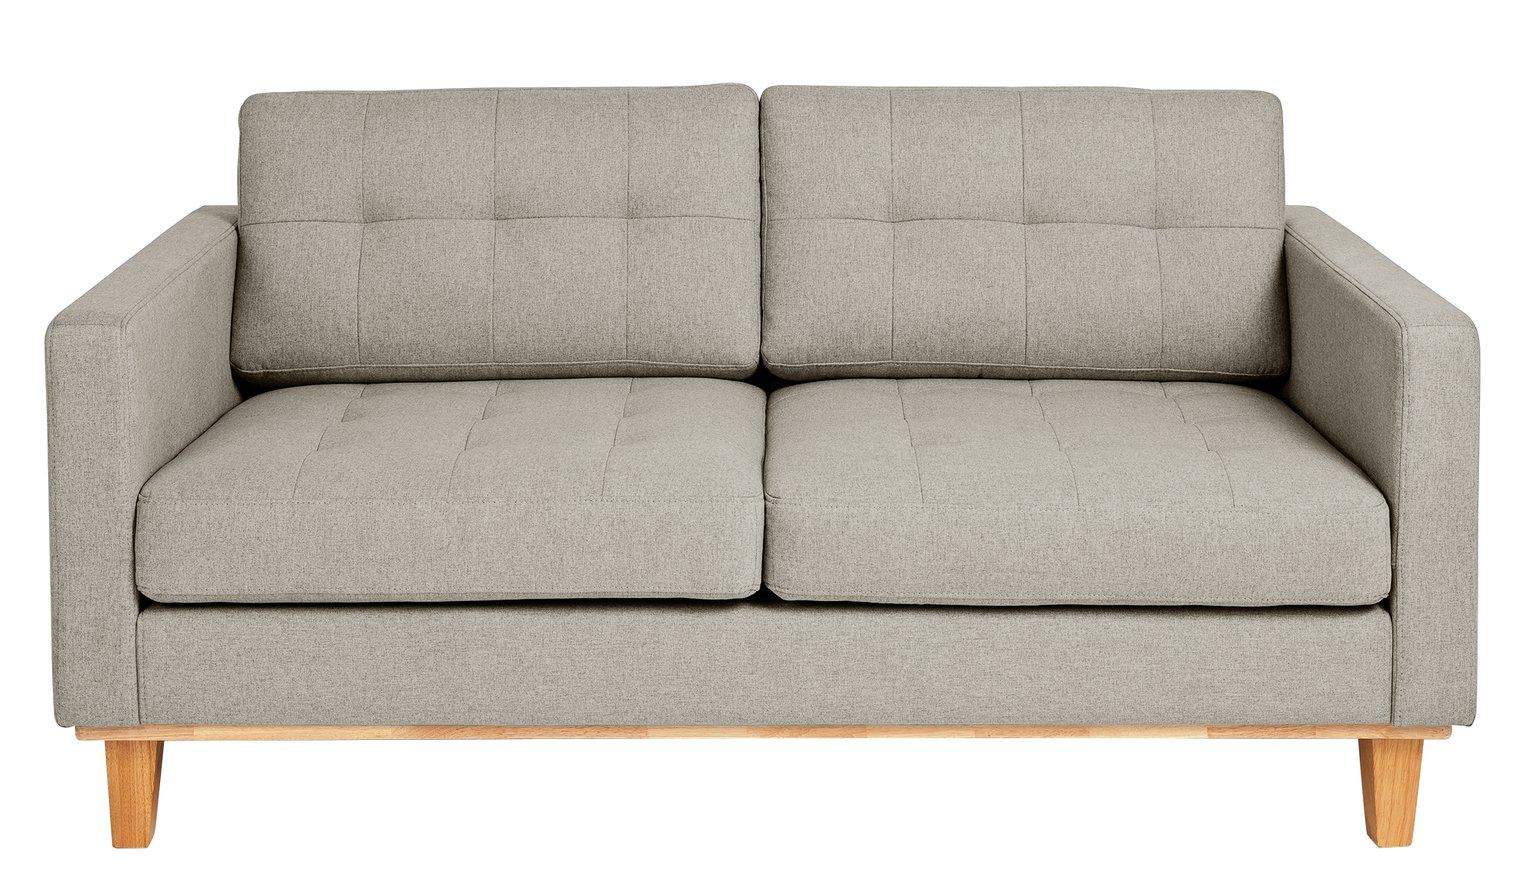 Argos Home Aliso 2 Seater Fabric Sofa Light Grey 380 00 Argos In 2020 Argos Home Light Gray Sofas Fabric Sofa